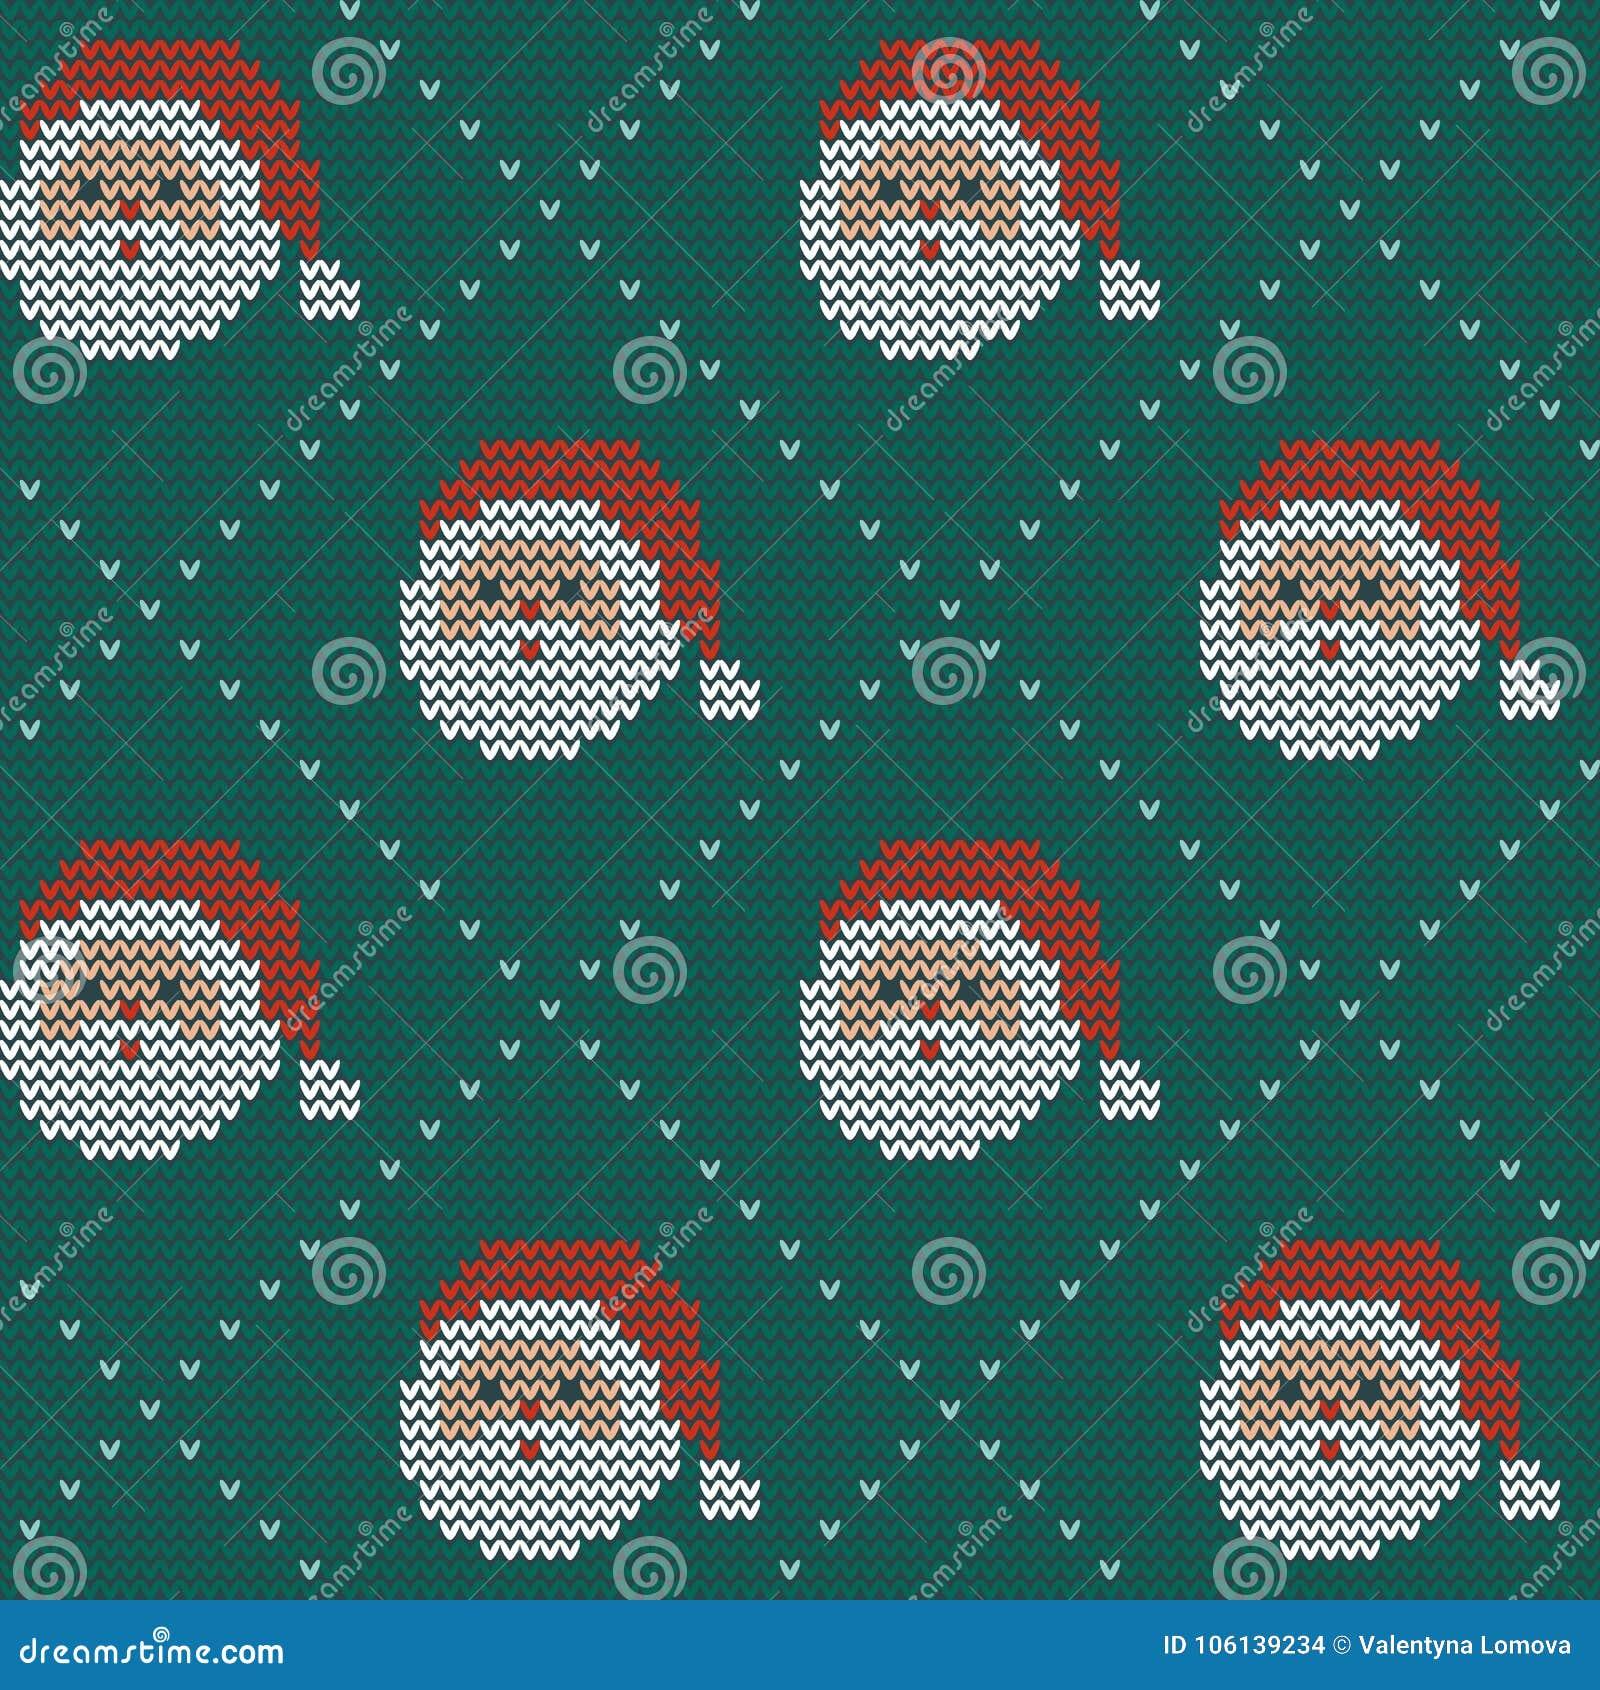 Naadloos Kerstmis noords breiend vectorpatroon met Selburose en decoratieve elementen